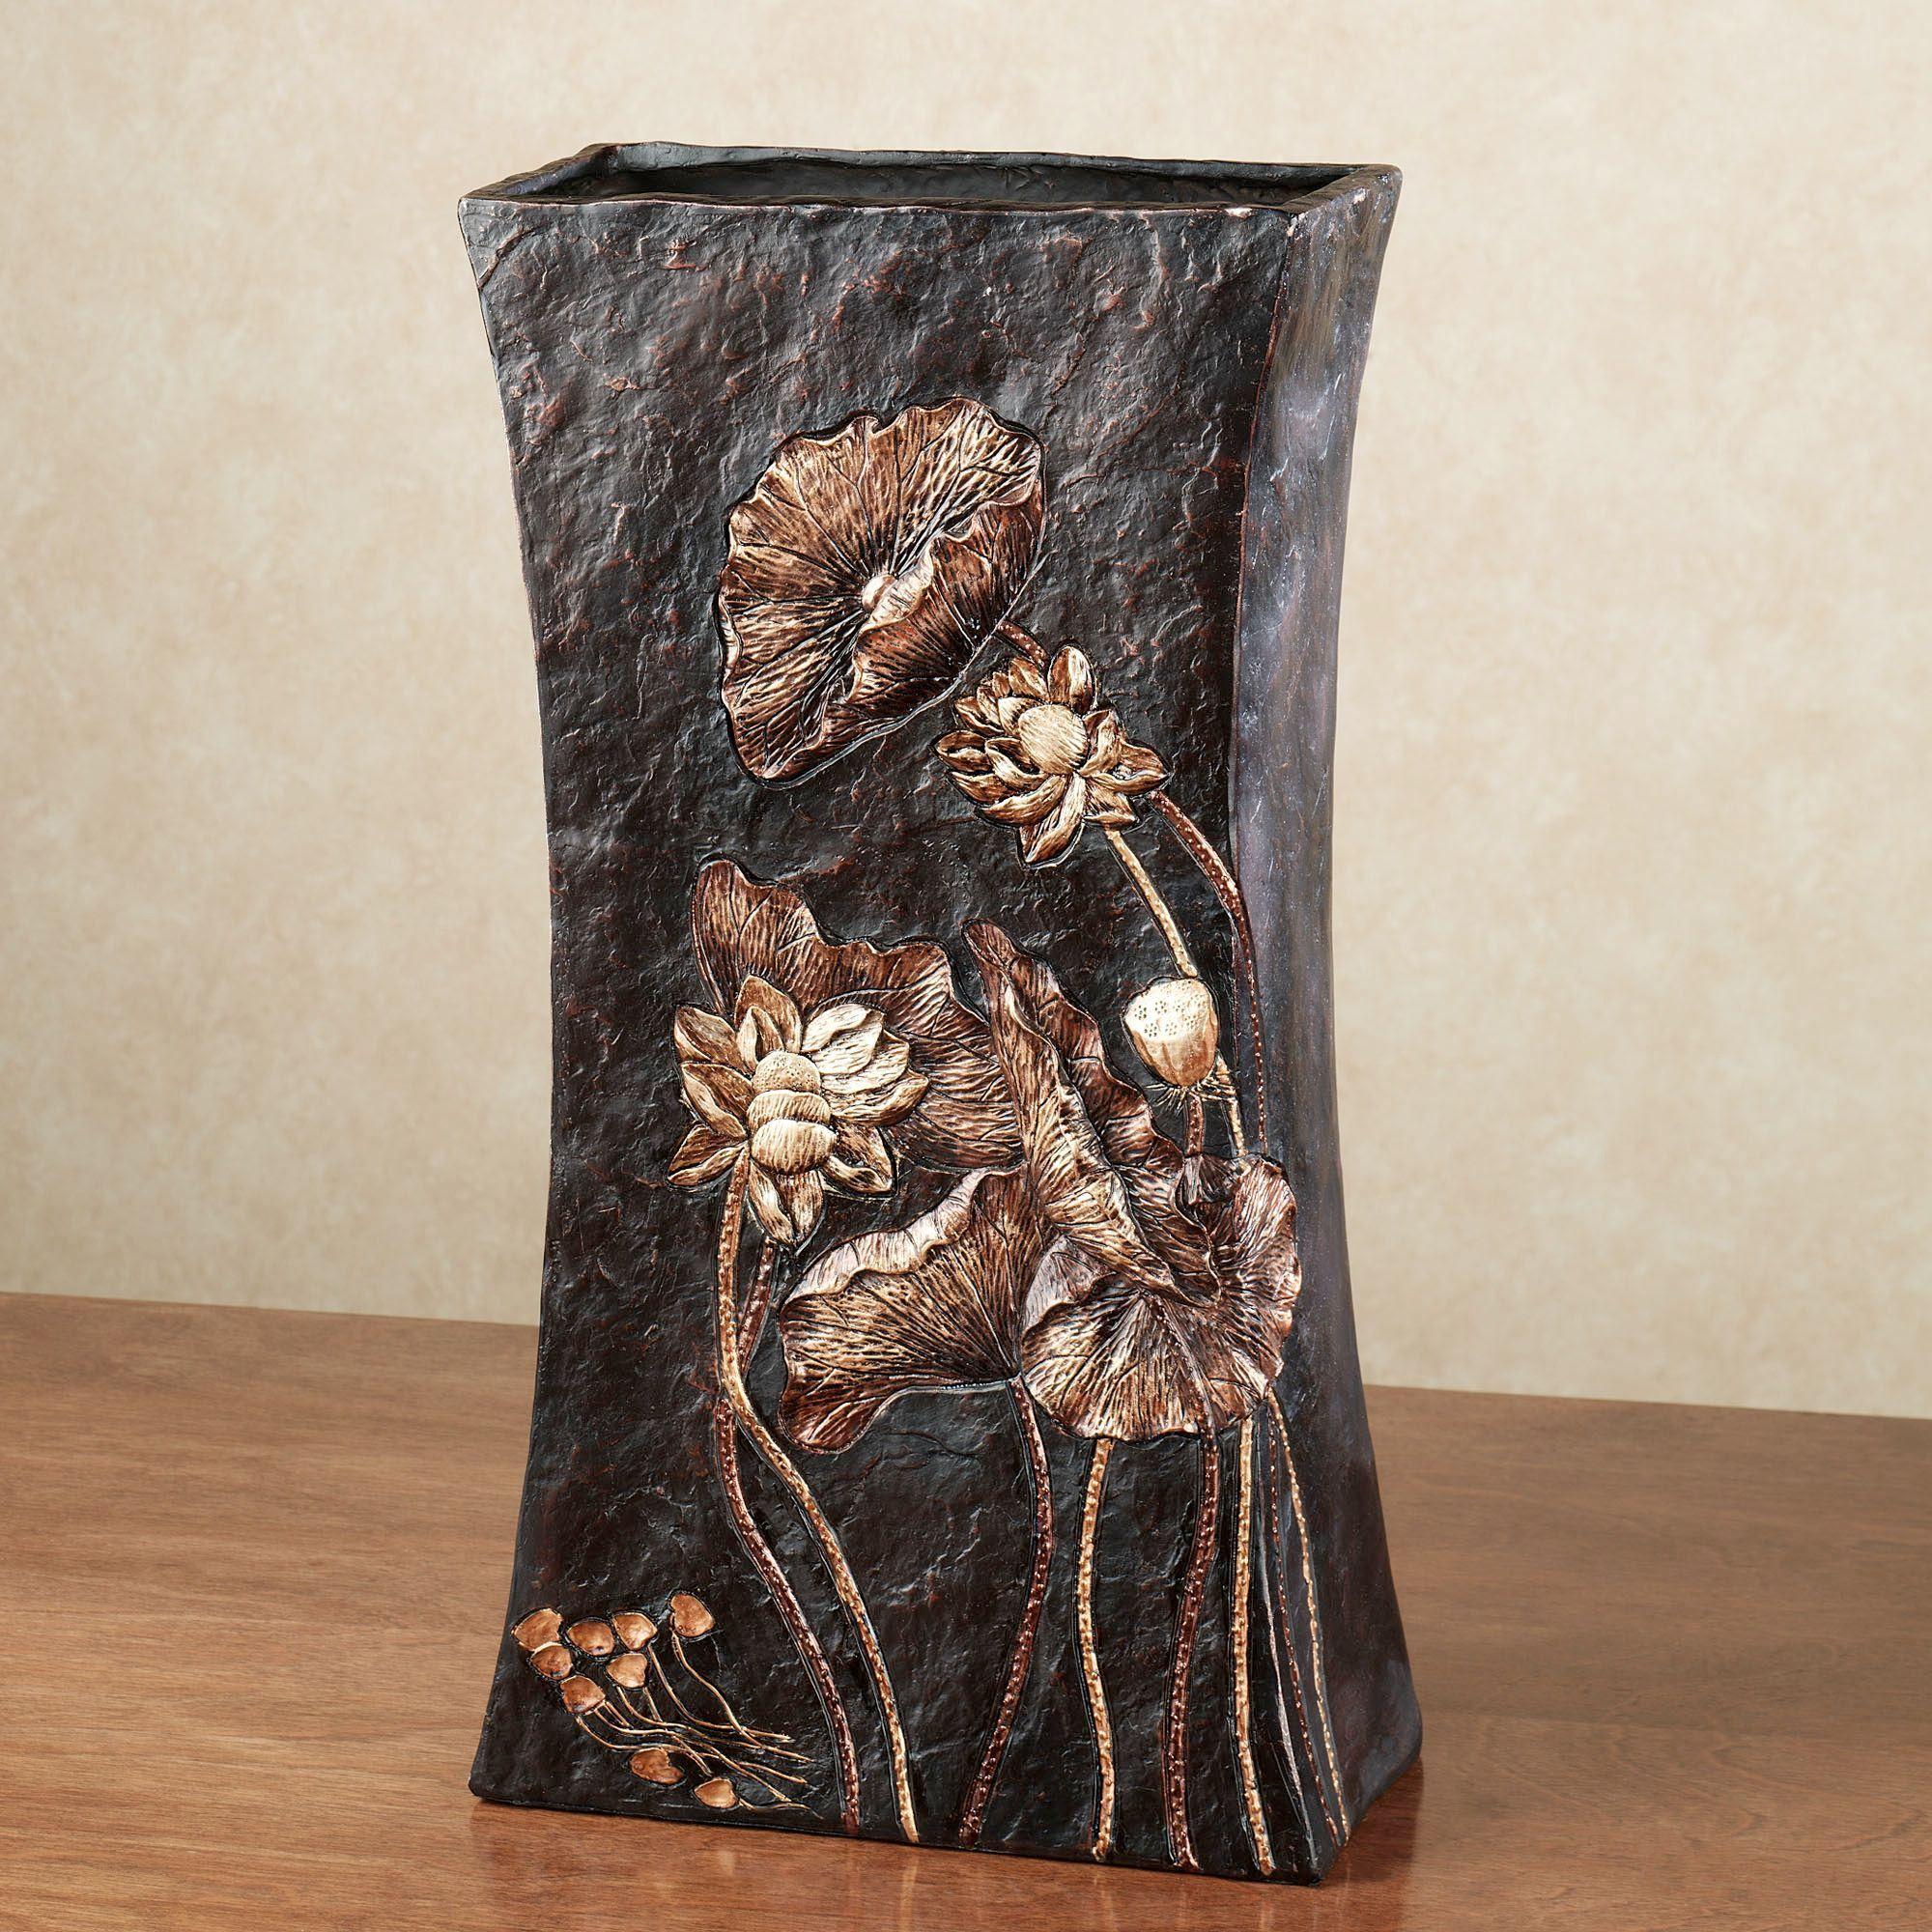 Deep Woods Textured Decorative Table Vase